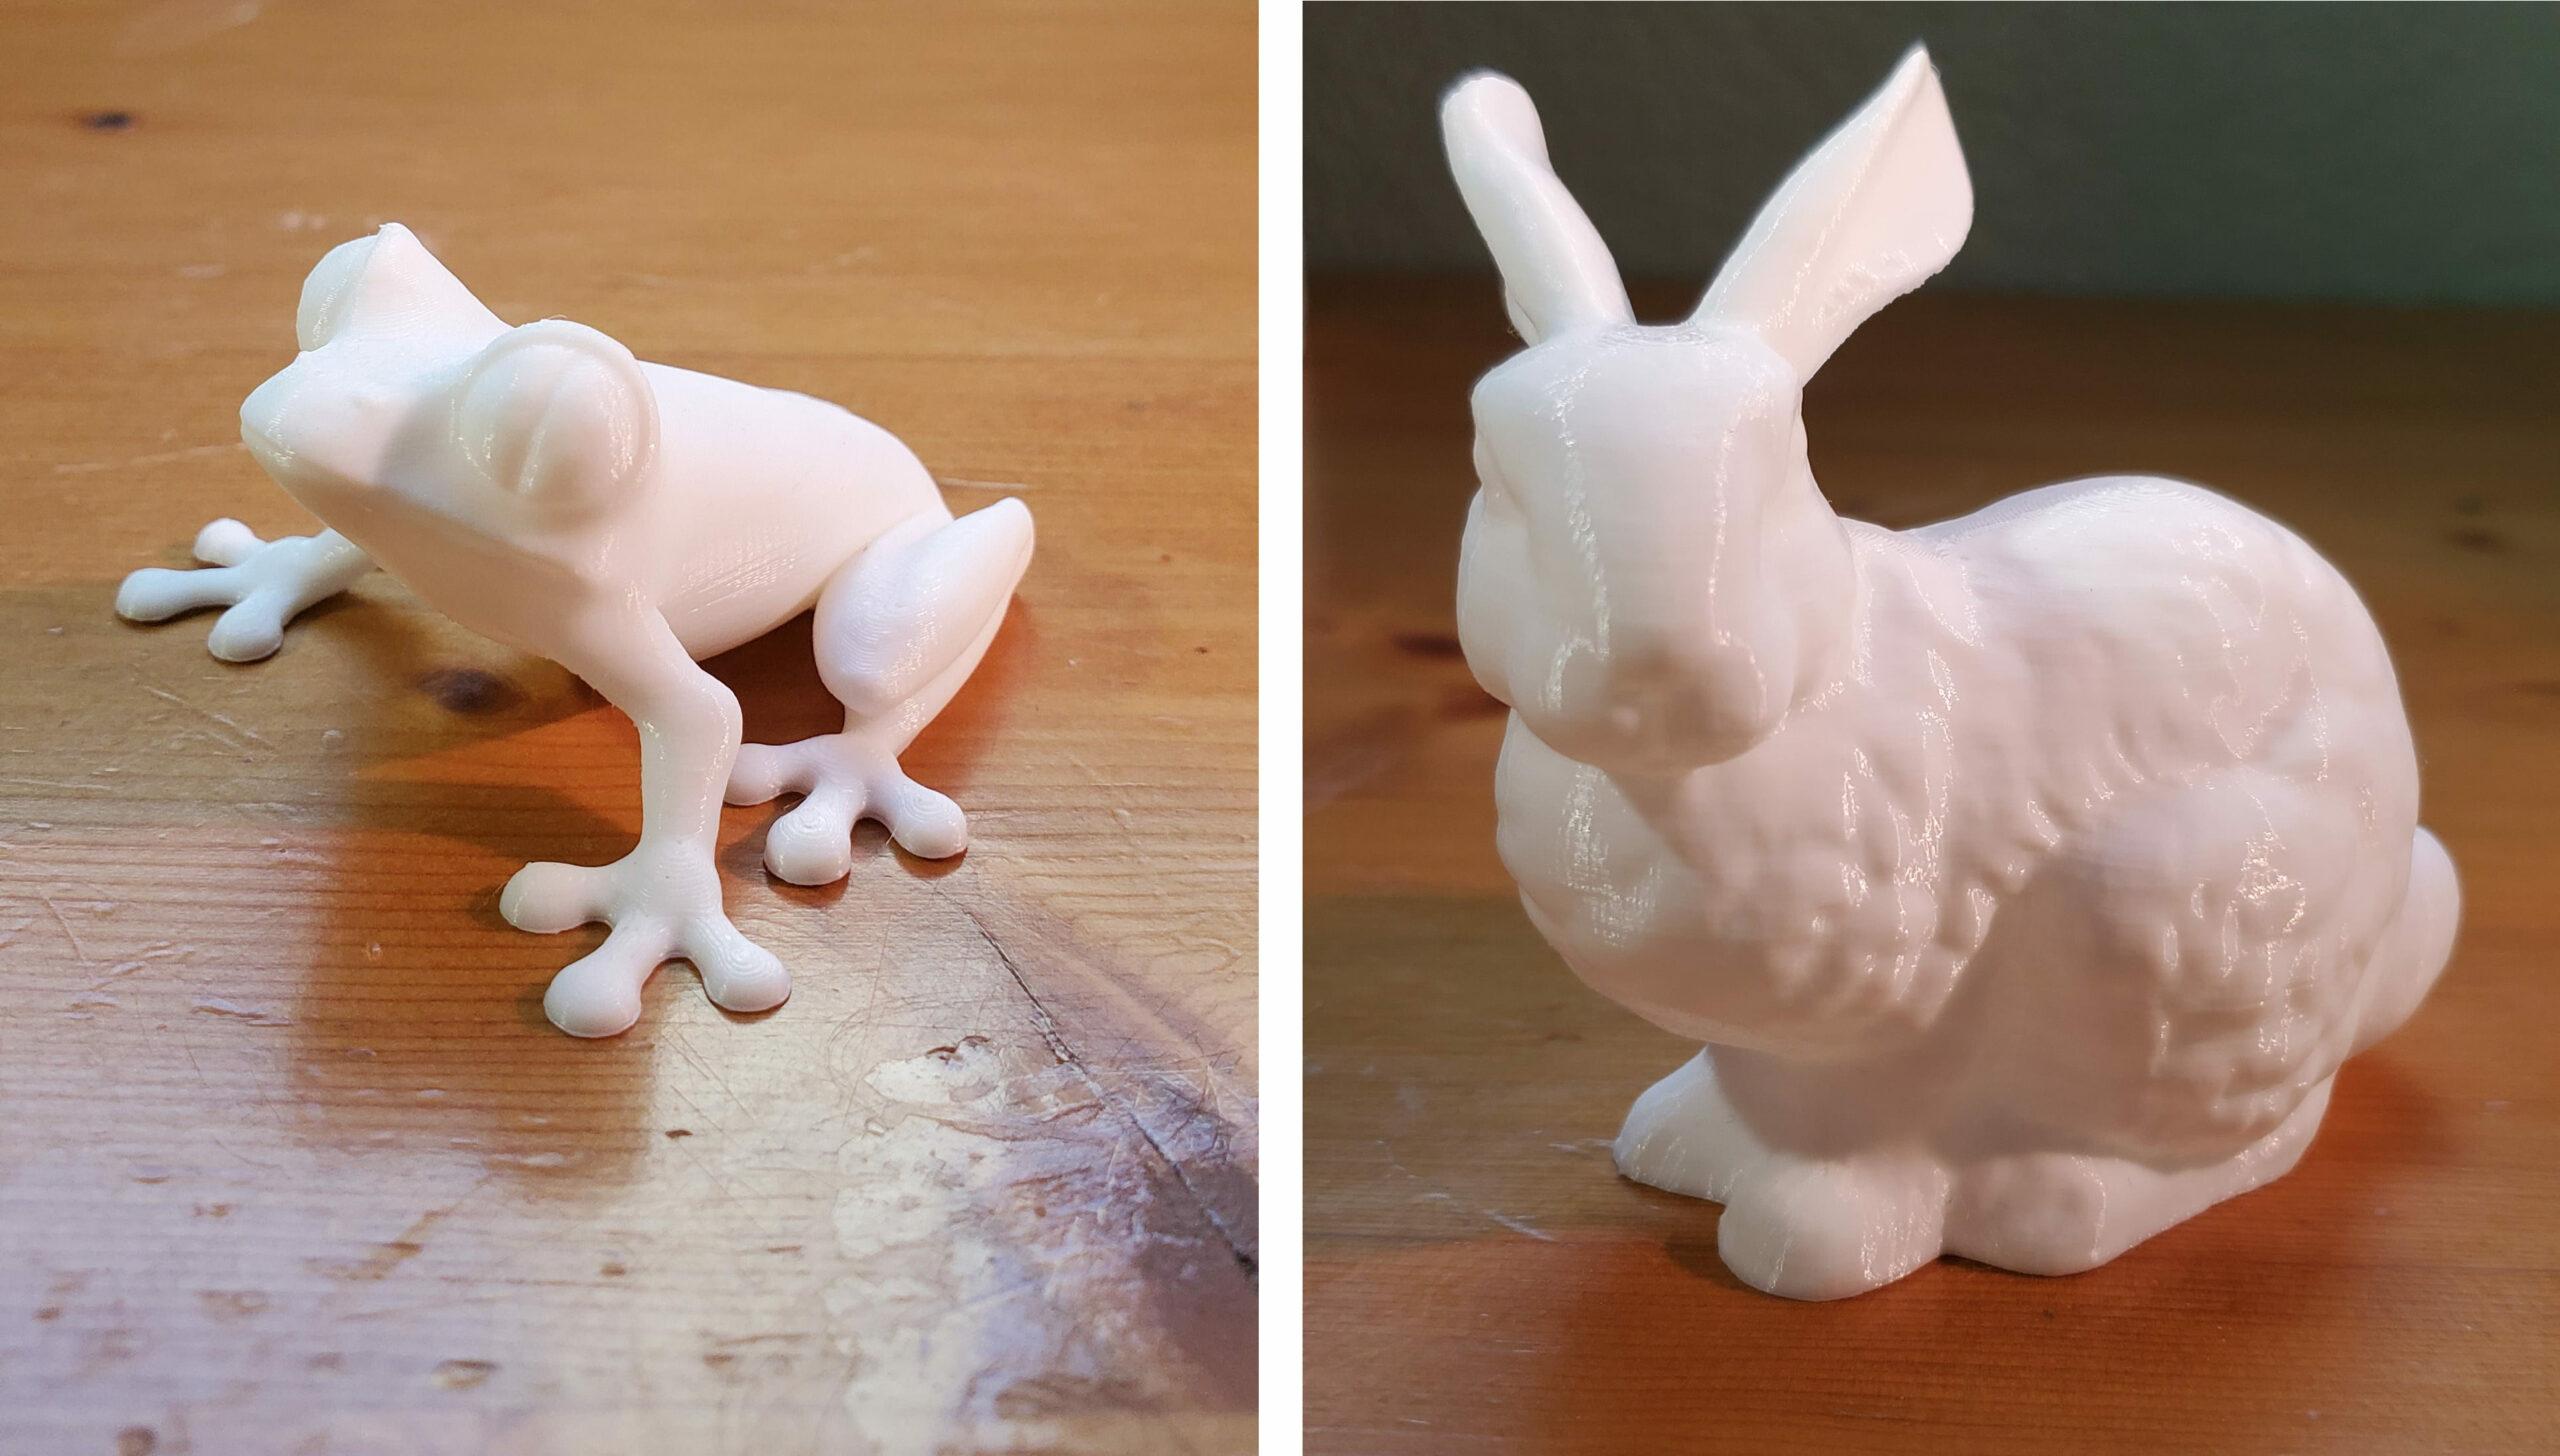 guider2s treefrog bunny test prints pla